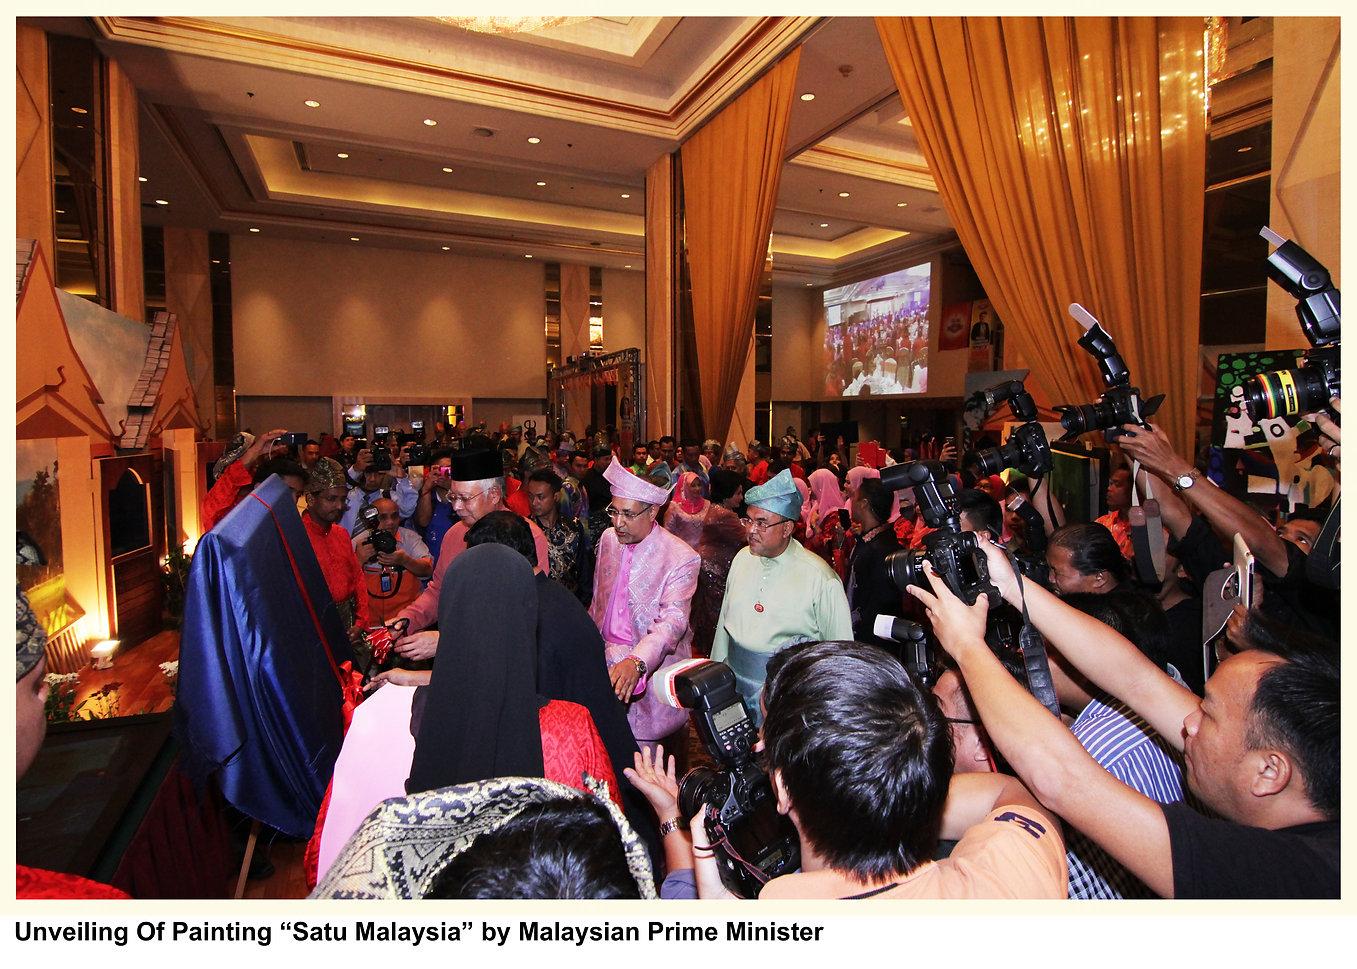 Sayu Malaysia - Painiting for Prime Minister of Malaysia